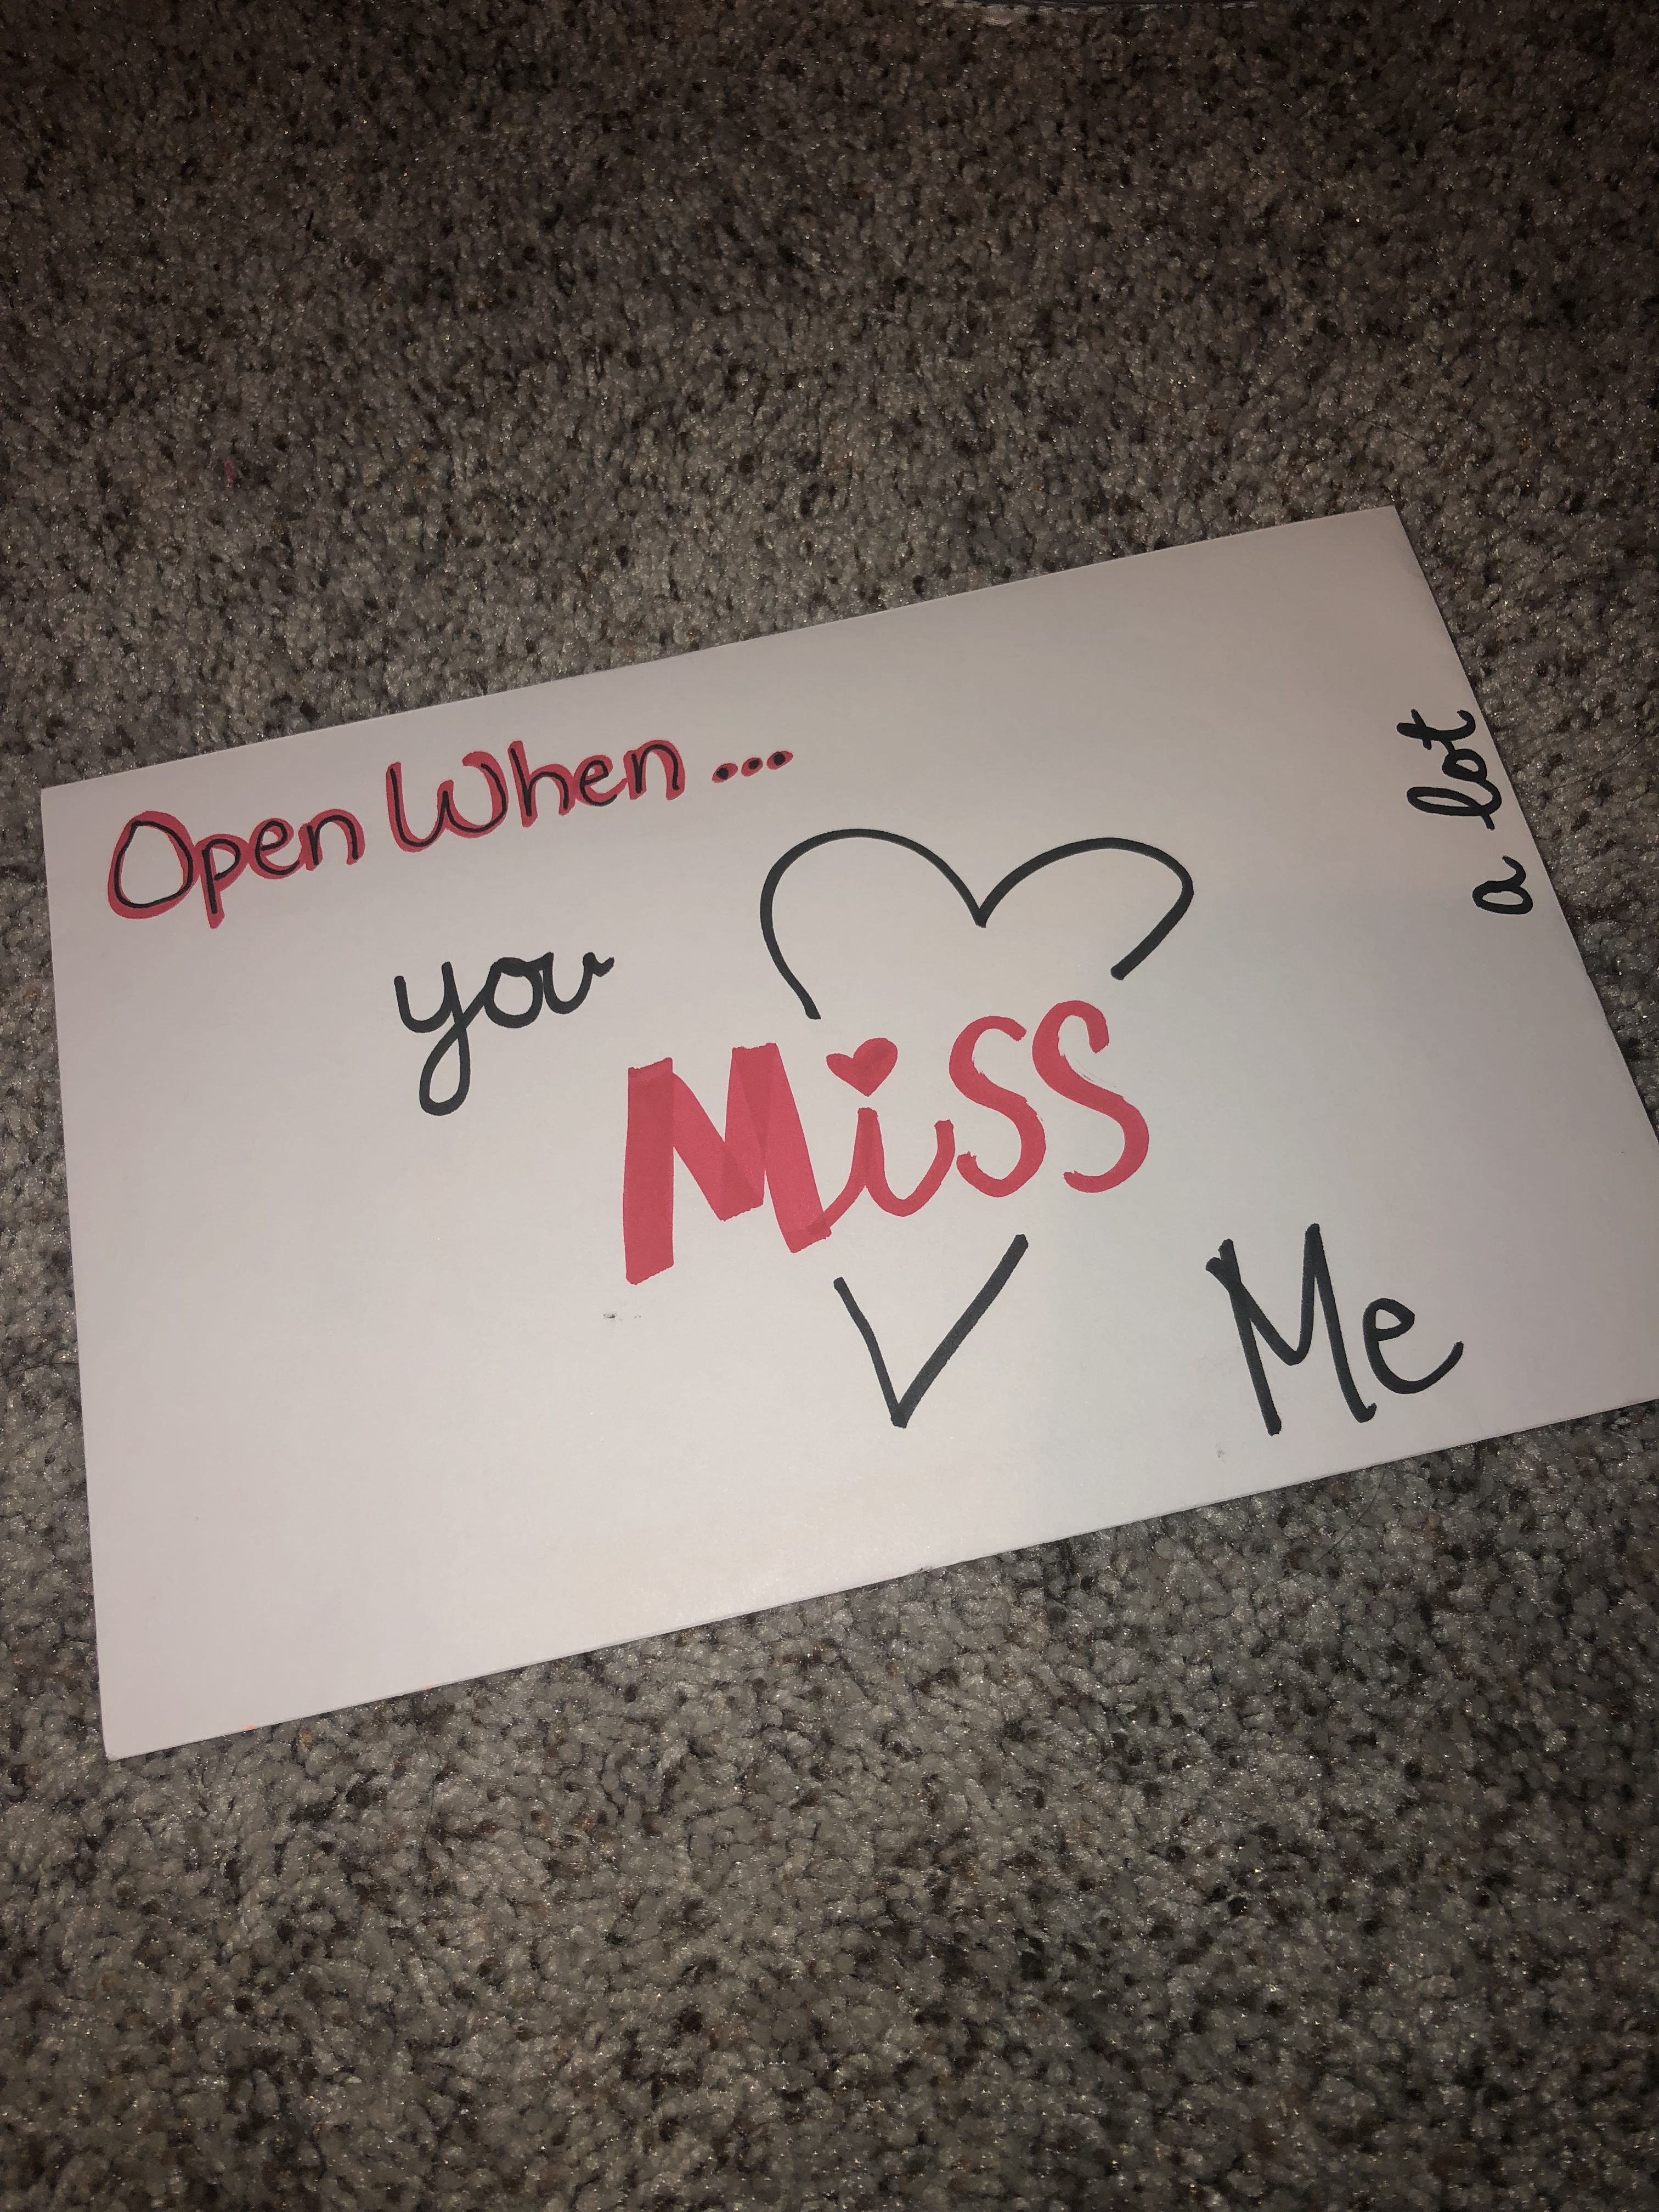 Open when you miss me a lot | Open when letters, Open when